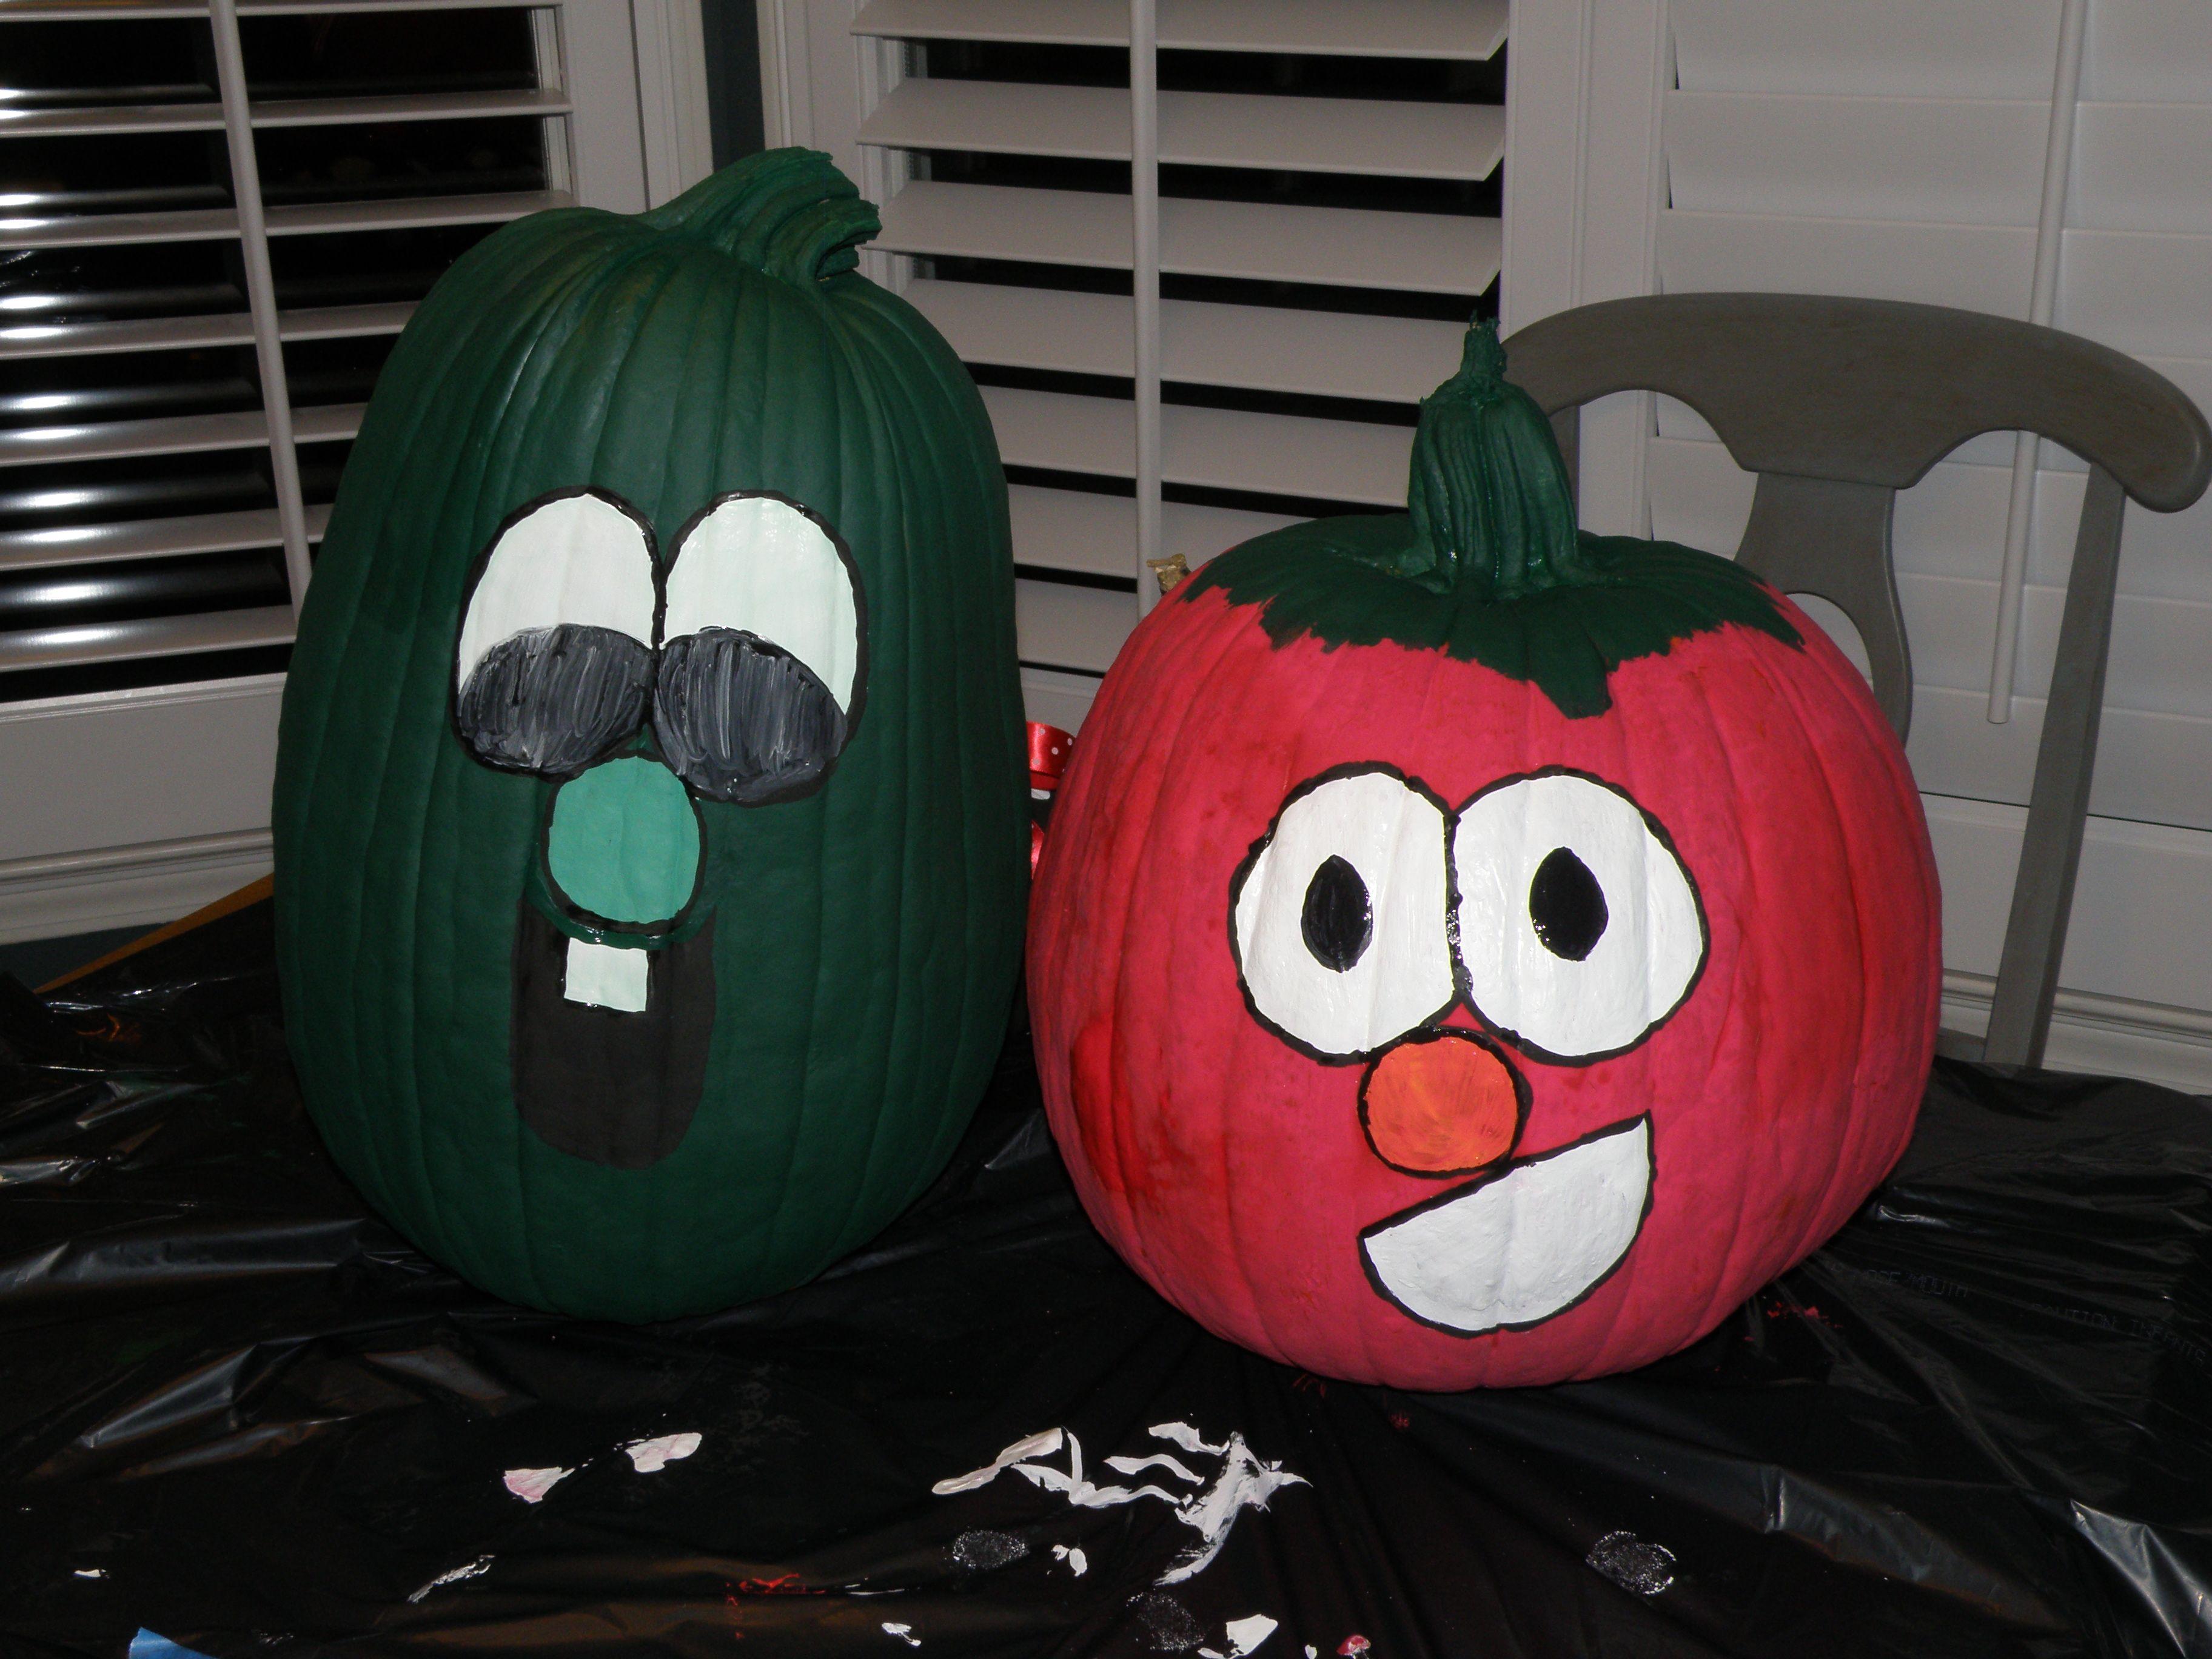 Veggietales penniless princess coloring pages - Veggietales Pumpkins